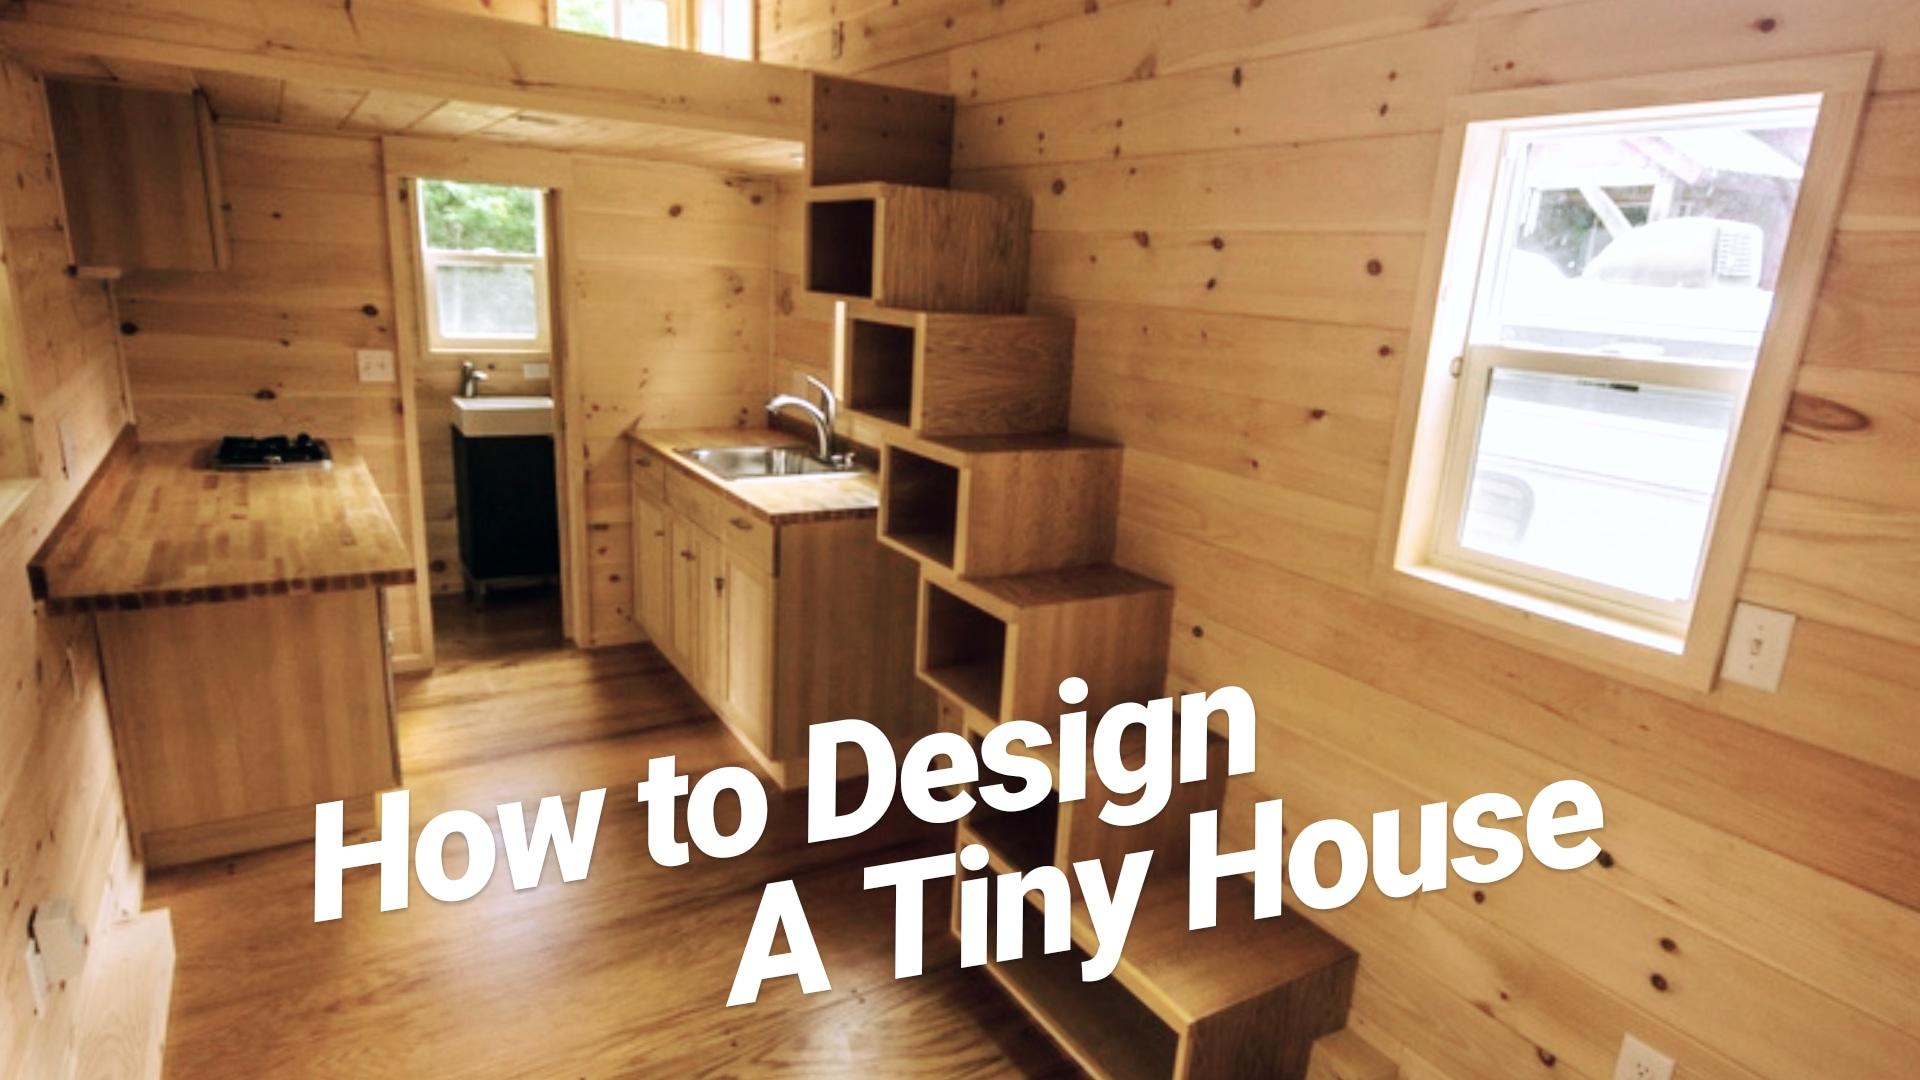 how-to-design-a-tiny-house.jpg